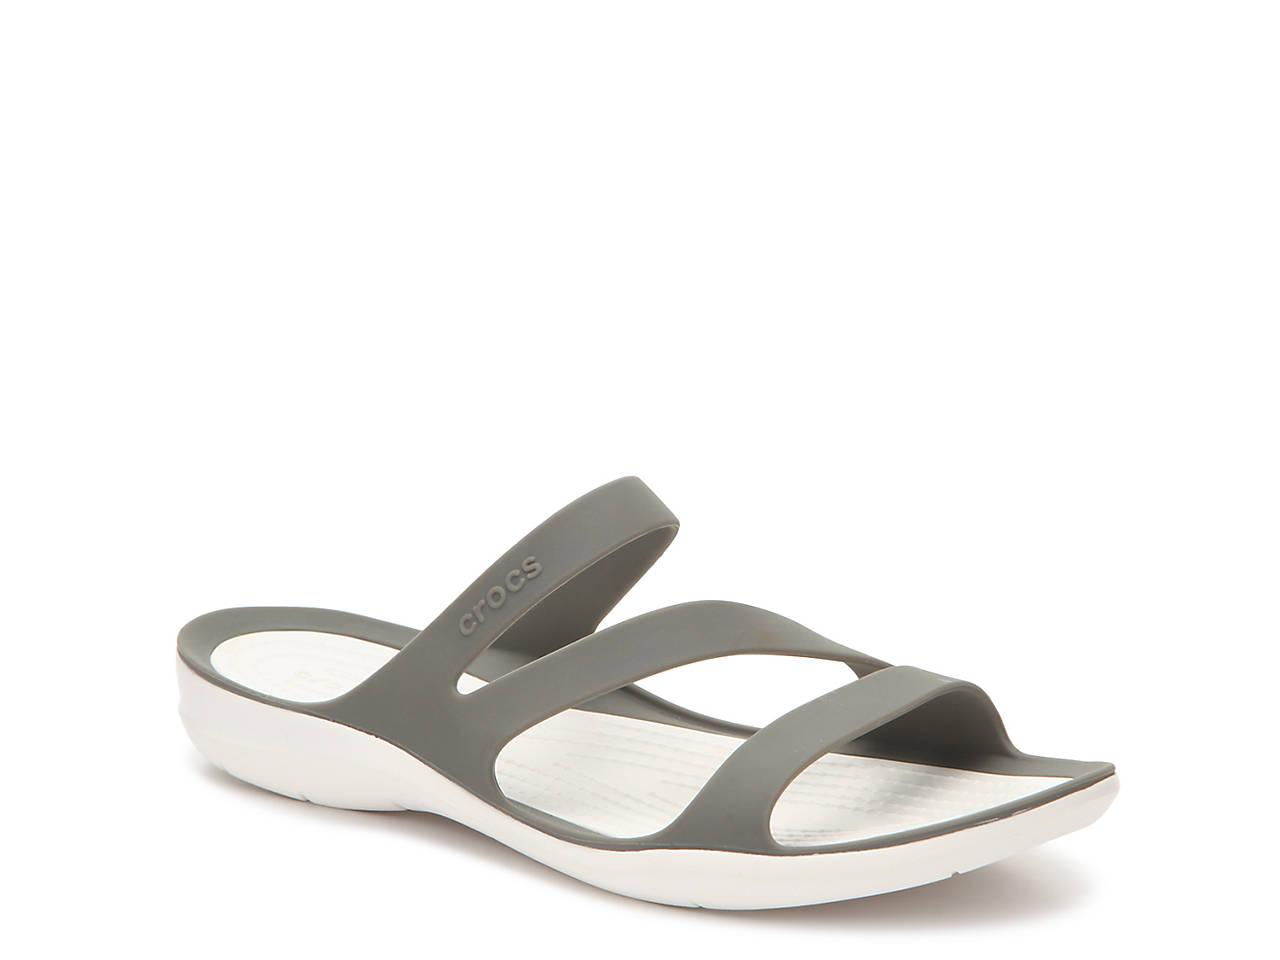 e569fa3fc408 Crocs Swiftwater Sandal Women s Shoes